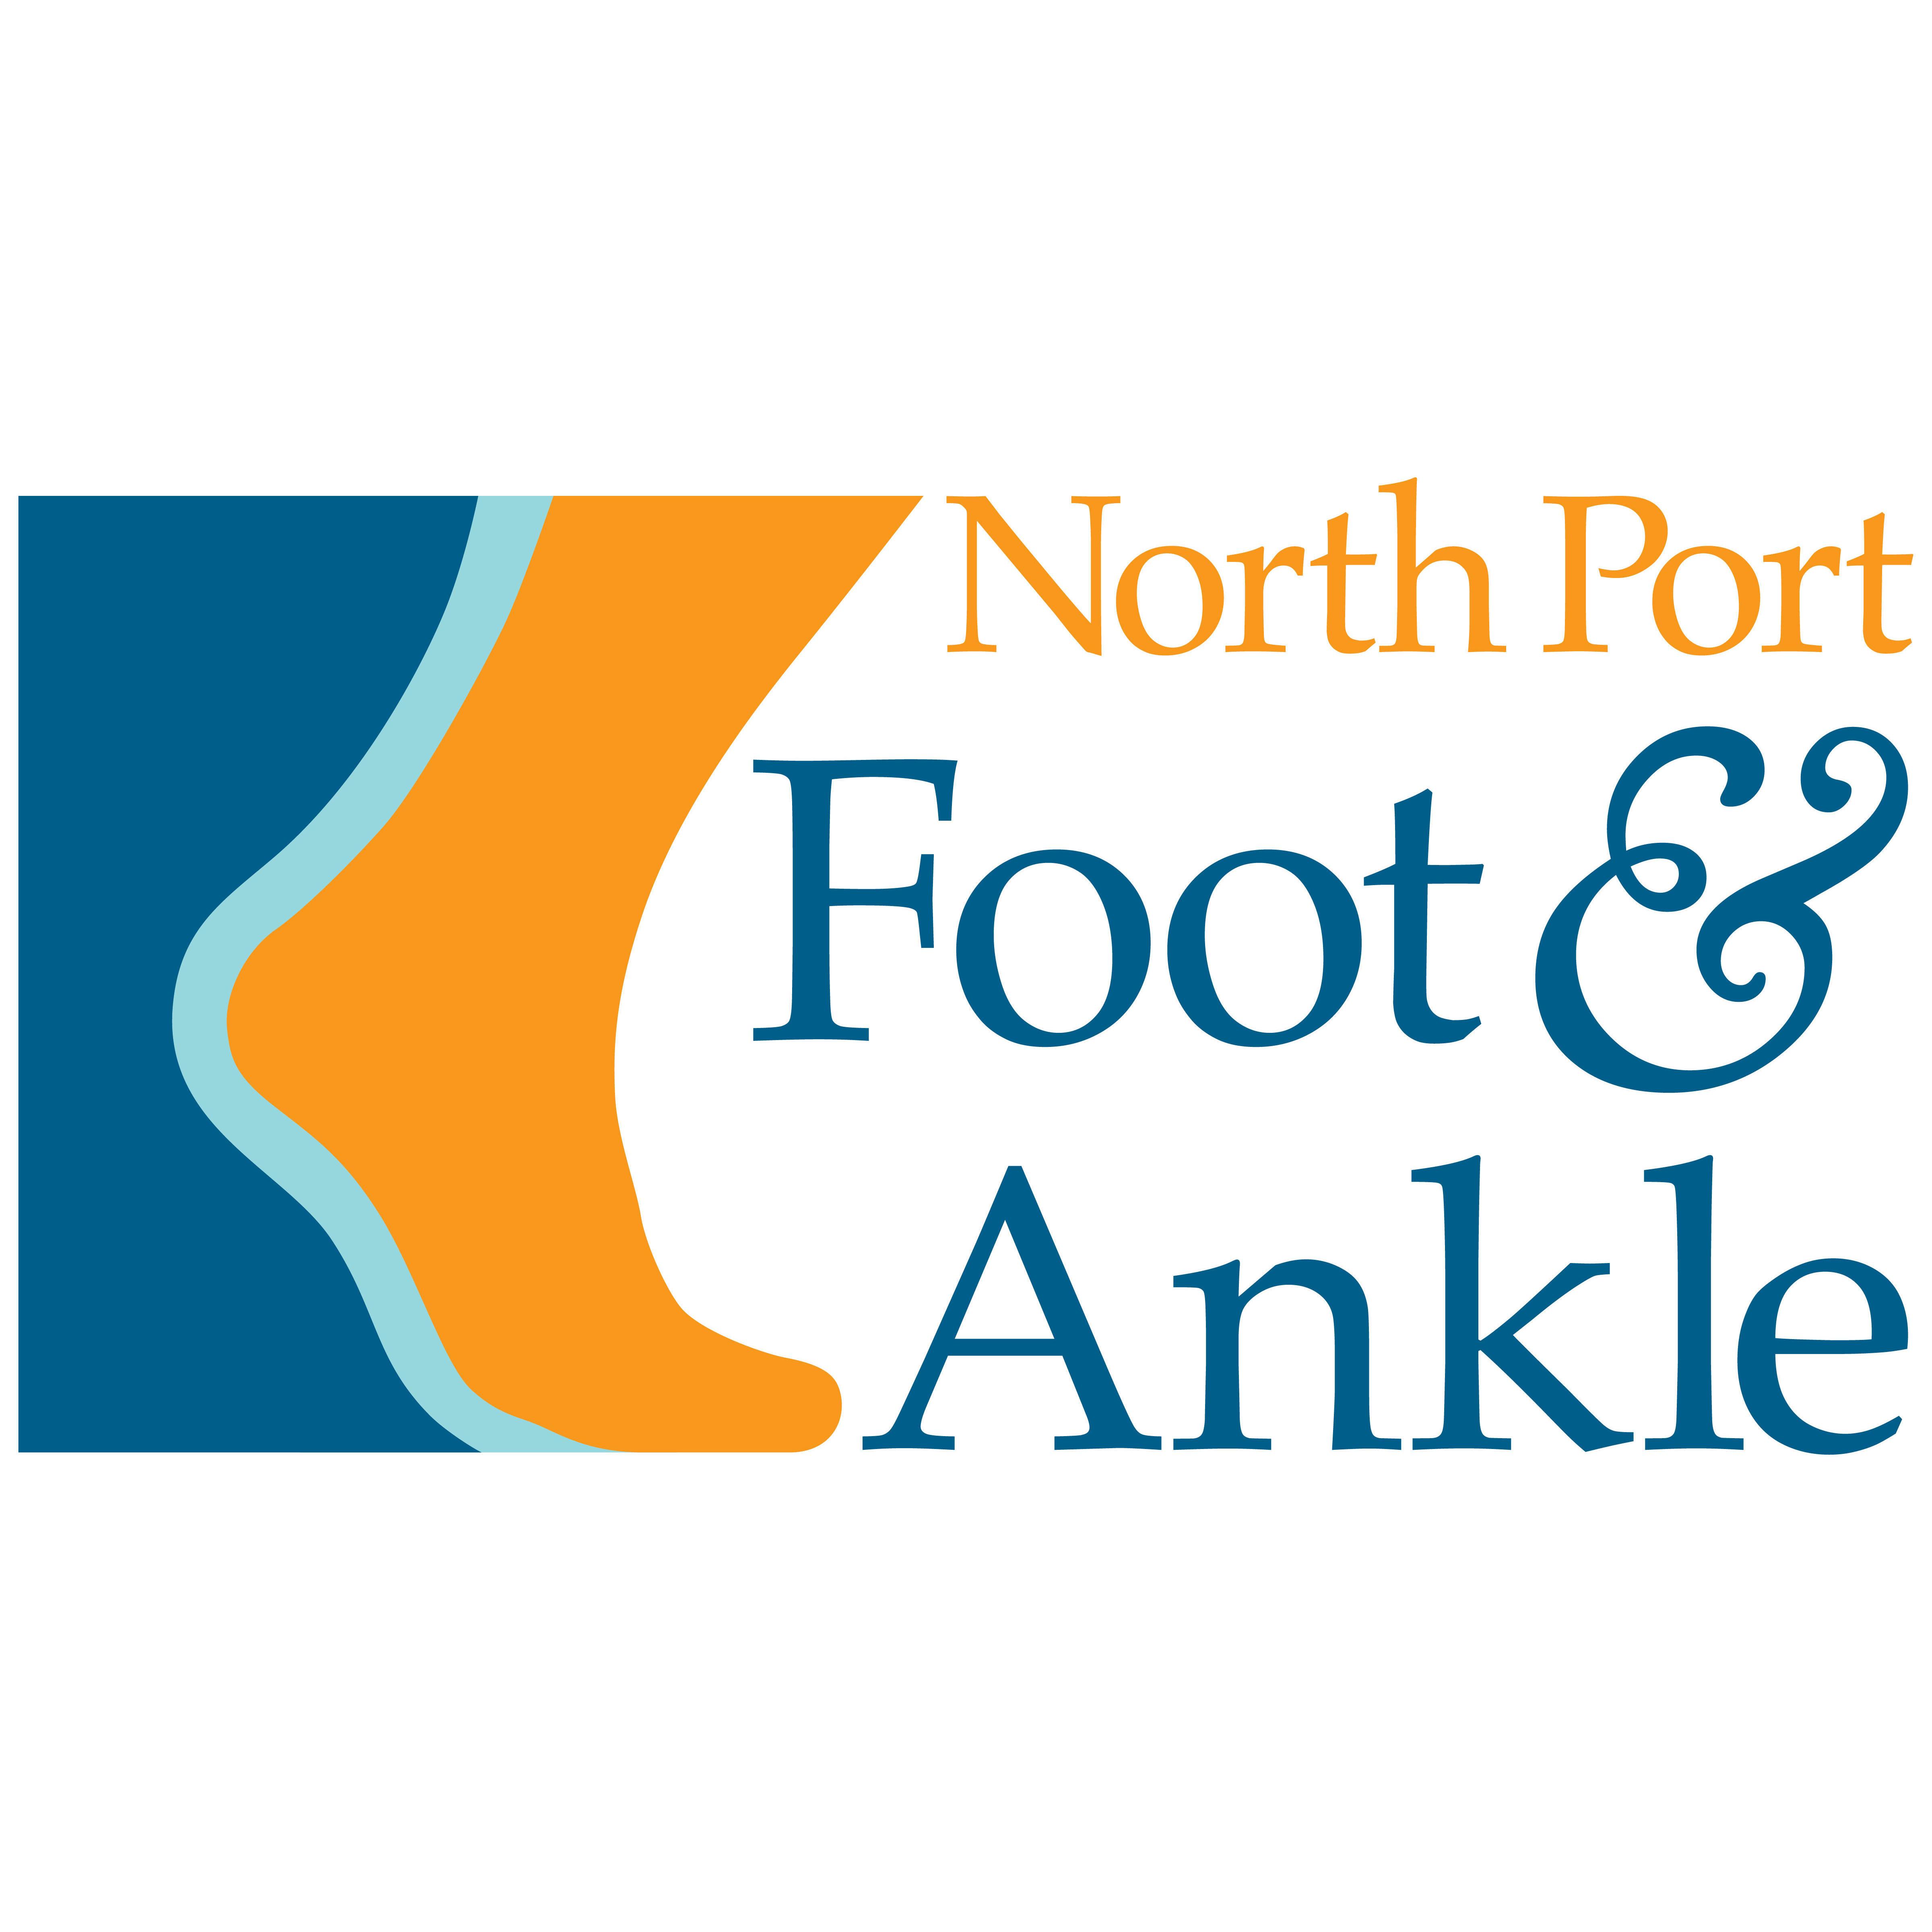 Scott P Kurecki DPM - North Port Foot and Ankle image 0